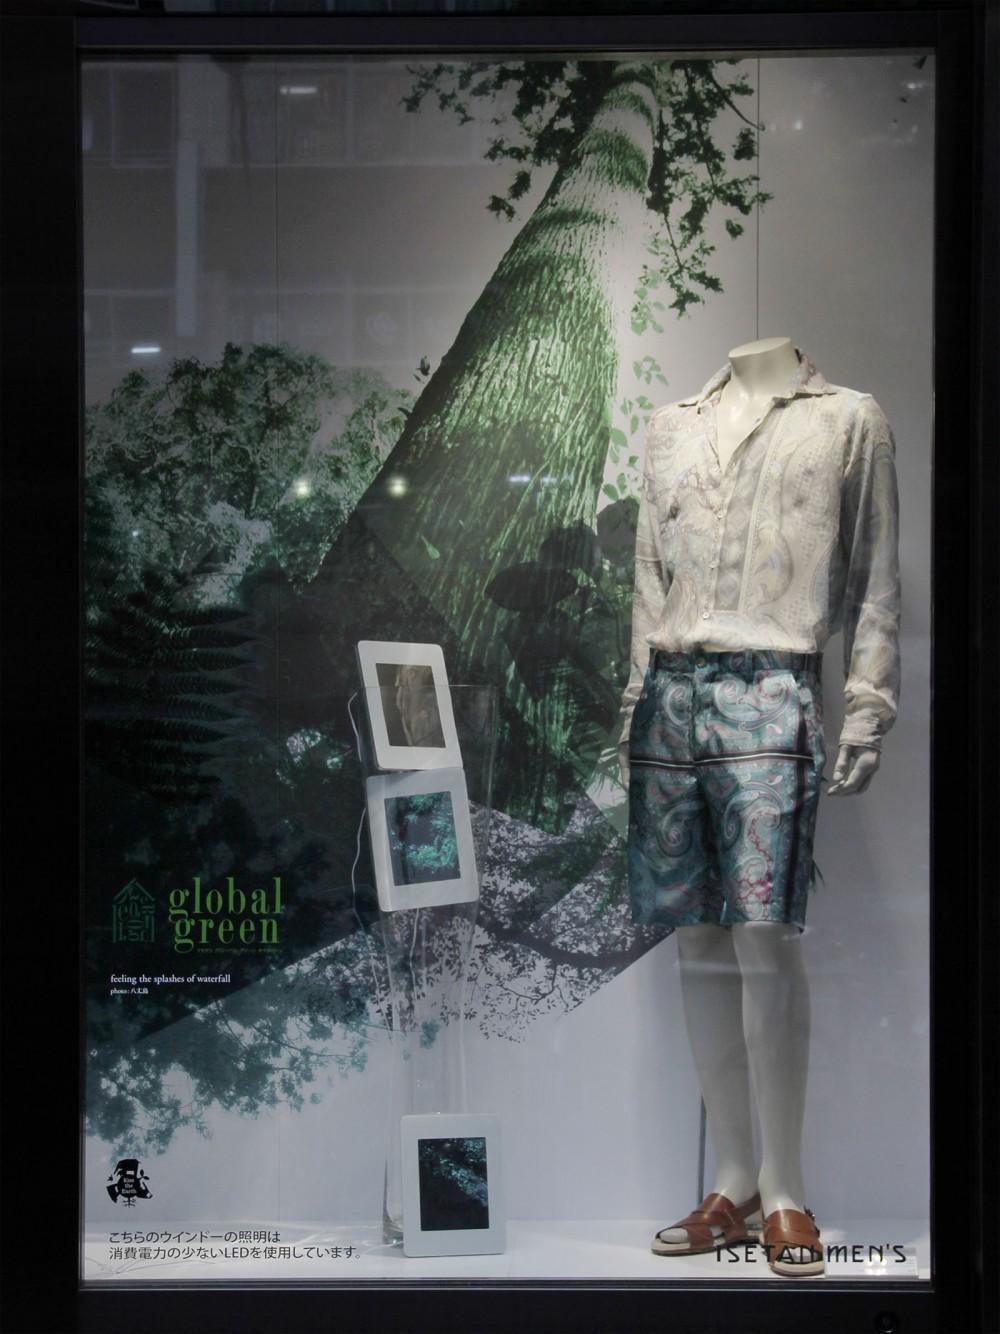 Grobal Green 2011